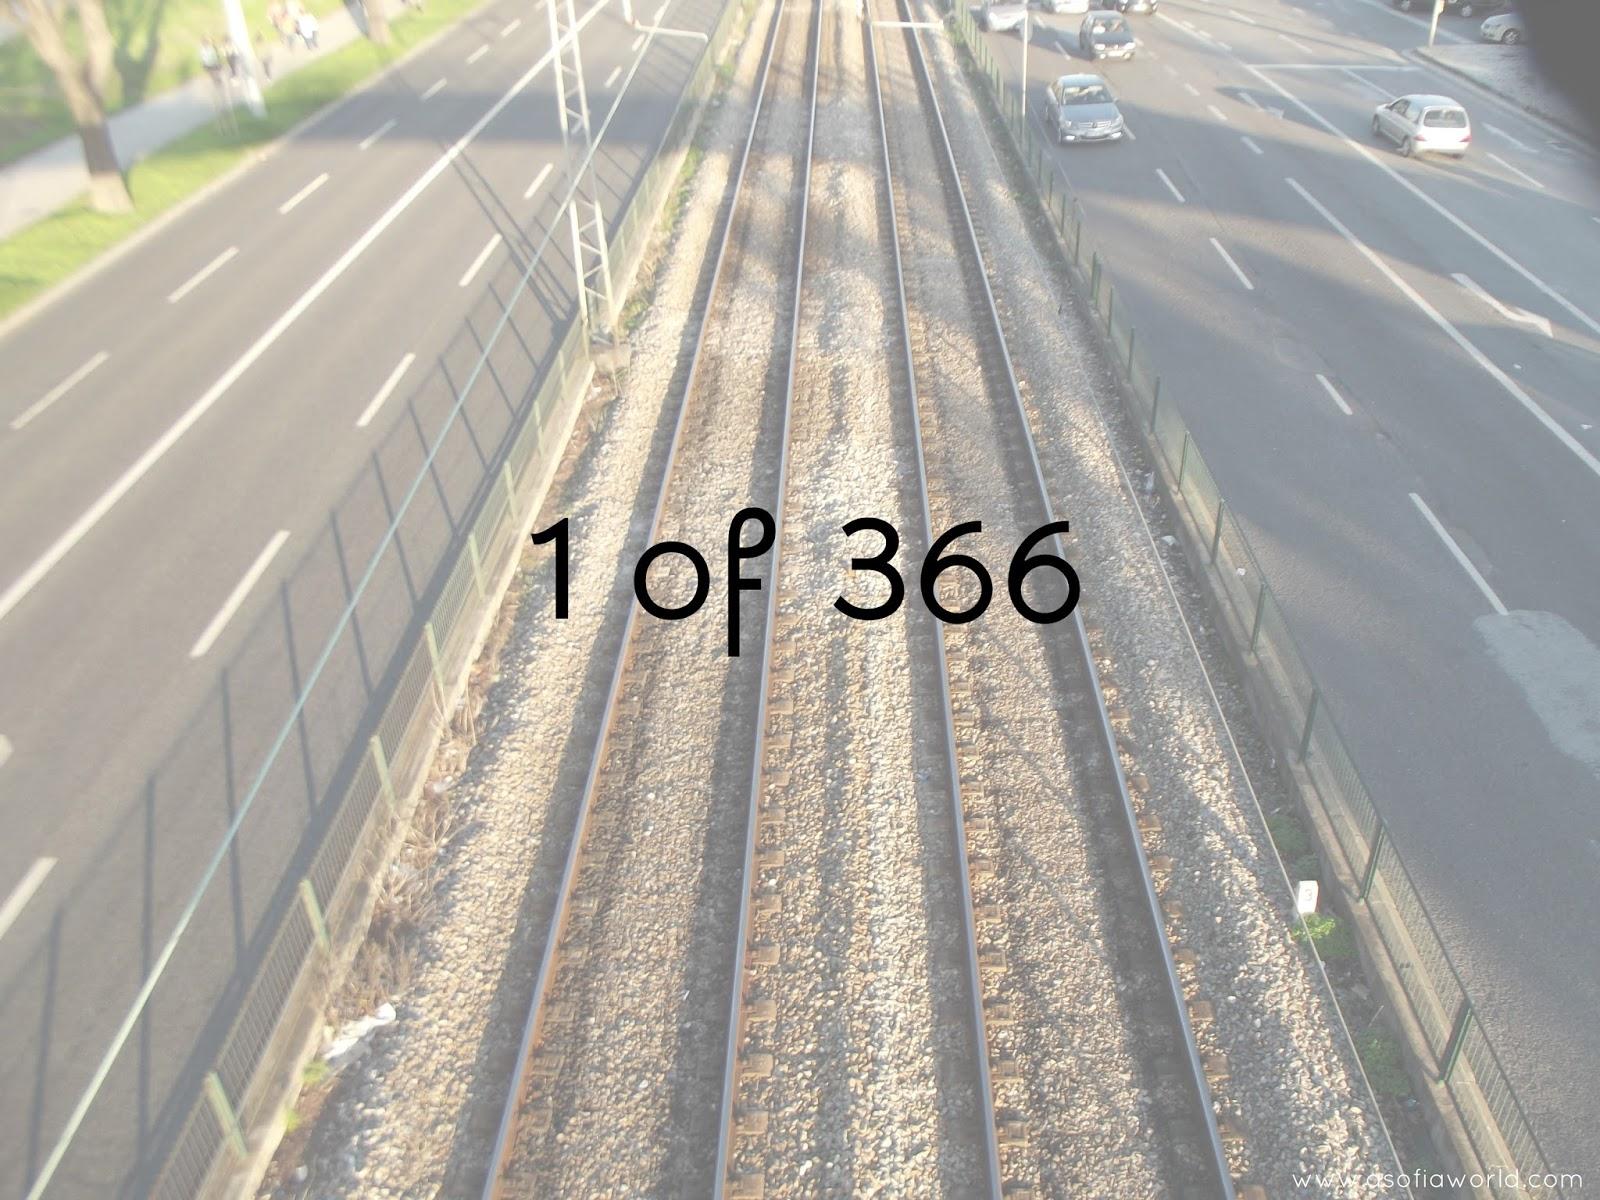 1 of 366